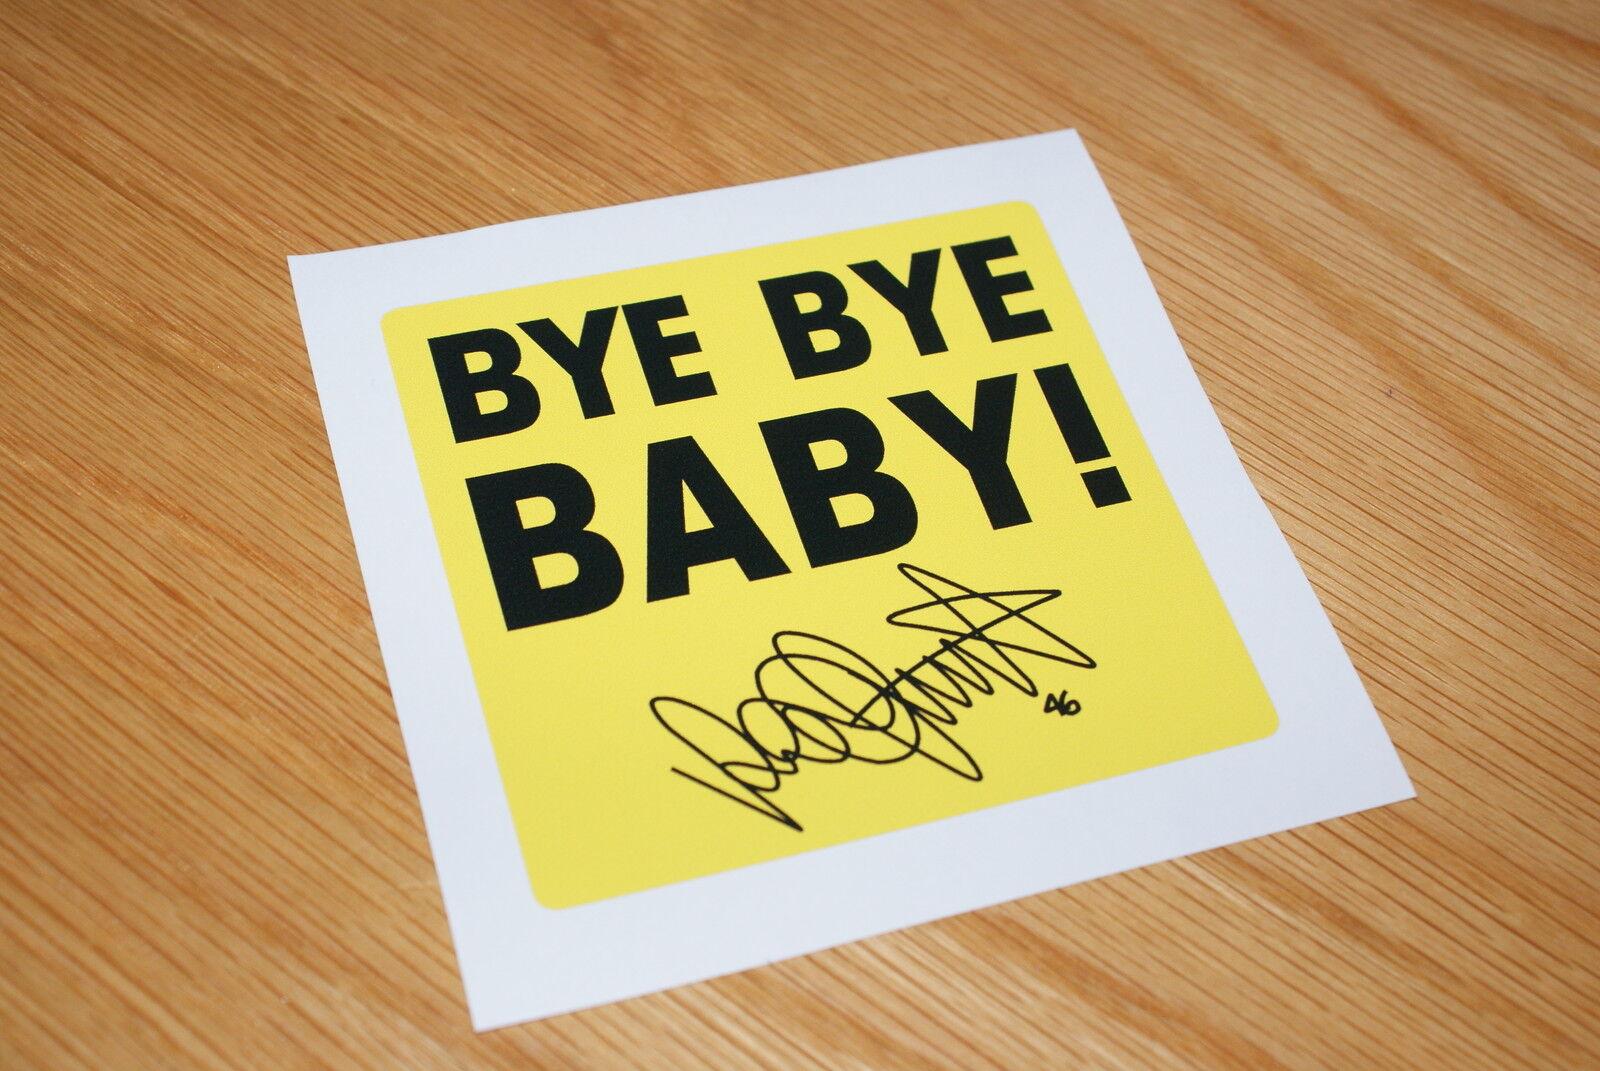 Rossi Bye Bye Baby Sticker Ebay